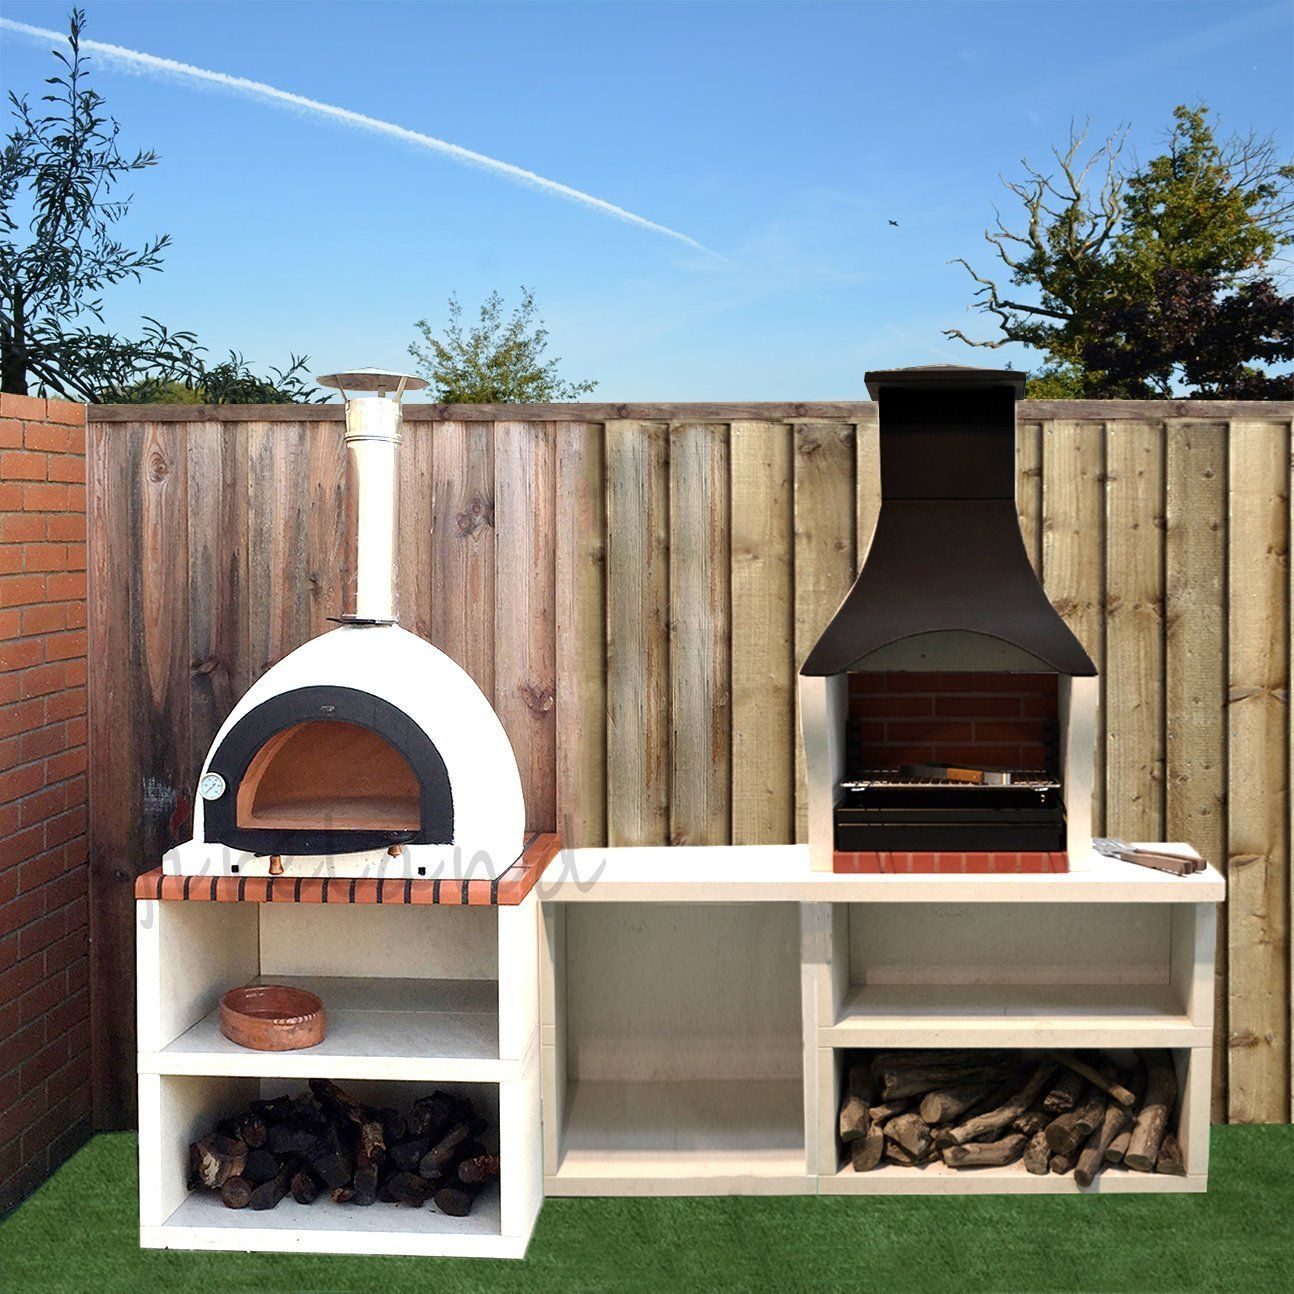 Napoli Outdoor Wood Fired Pizza Oven Barbecue Grill Garden Combo Kitchen Amazon Co Uk Garden Outdoors Barbekyu Terrasa Koptilnya